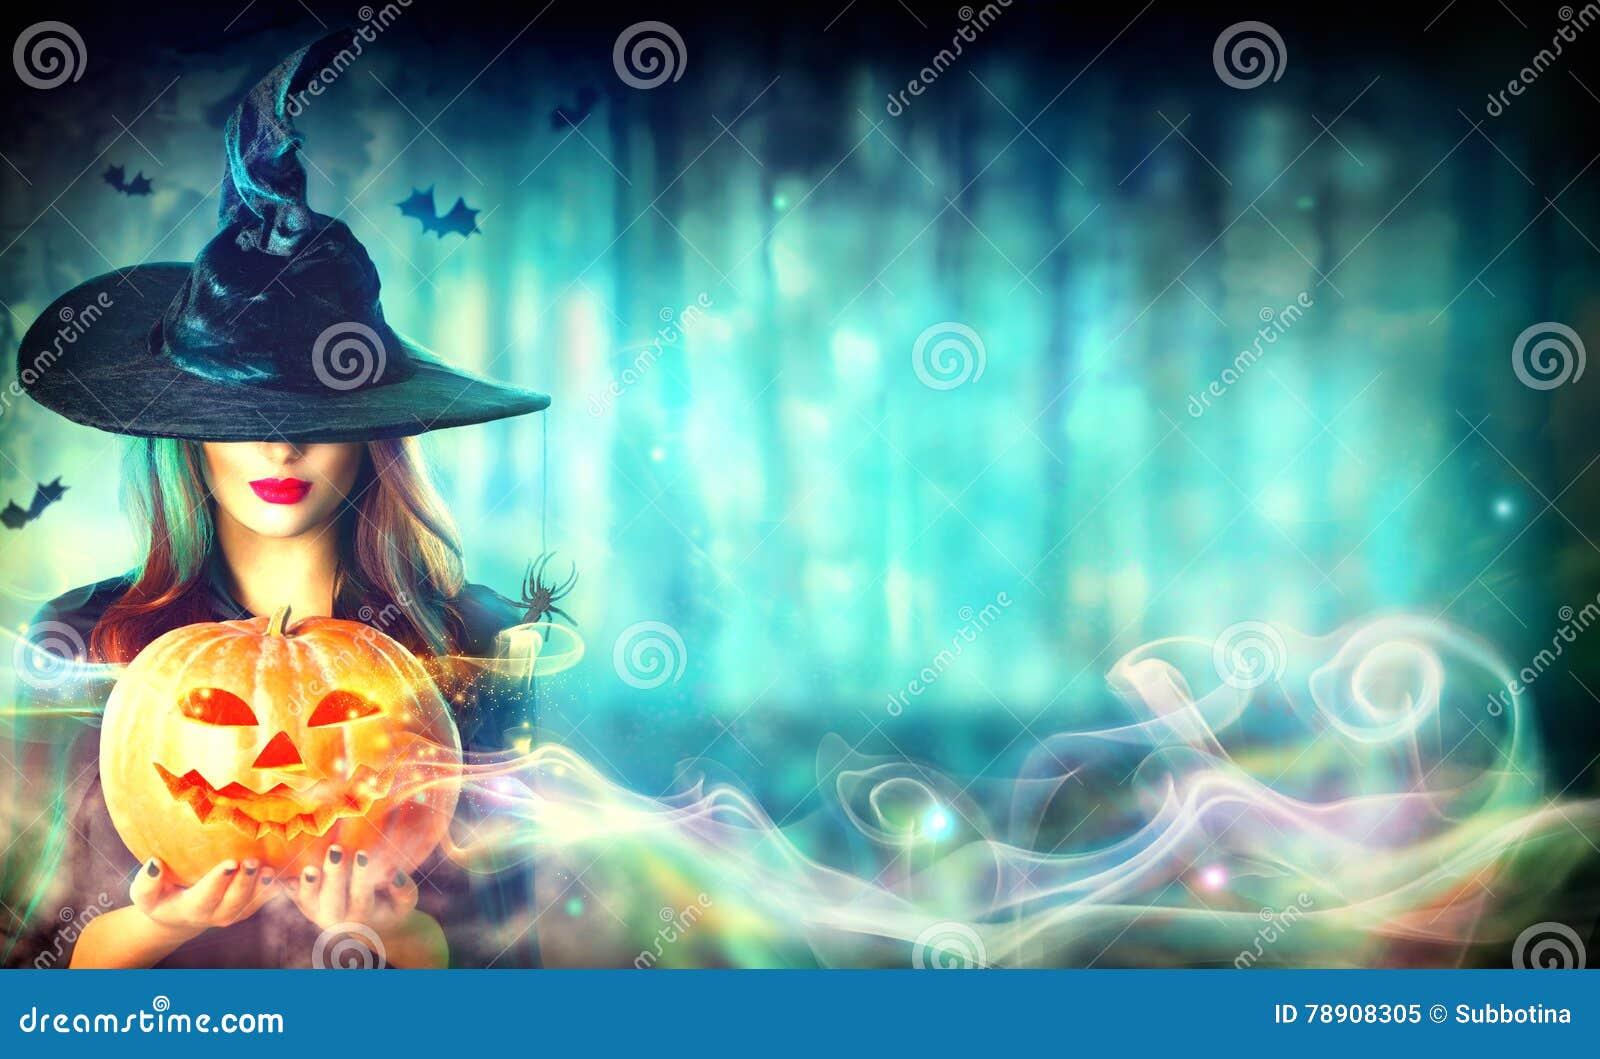 witch with a Halloween pumpkin Jack-o-lantern